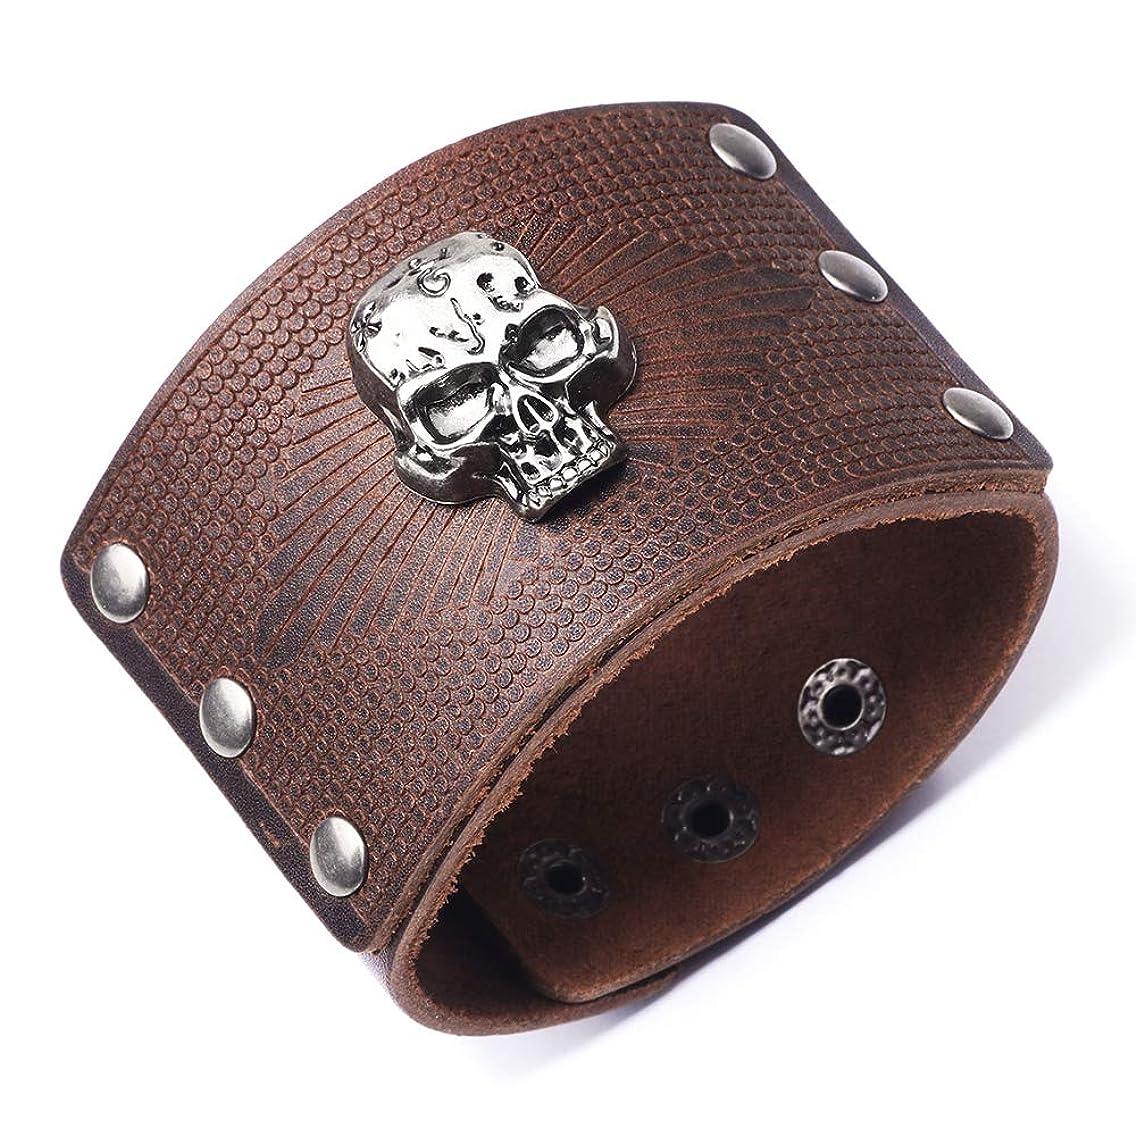 AZORA Punk Leather Bracelet Handmade Cuff Bangle Braided Wristband Adjustable Bracelets for Men,Kids,Boys,Women